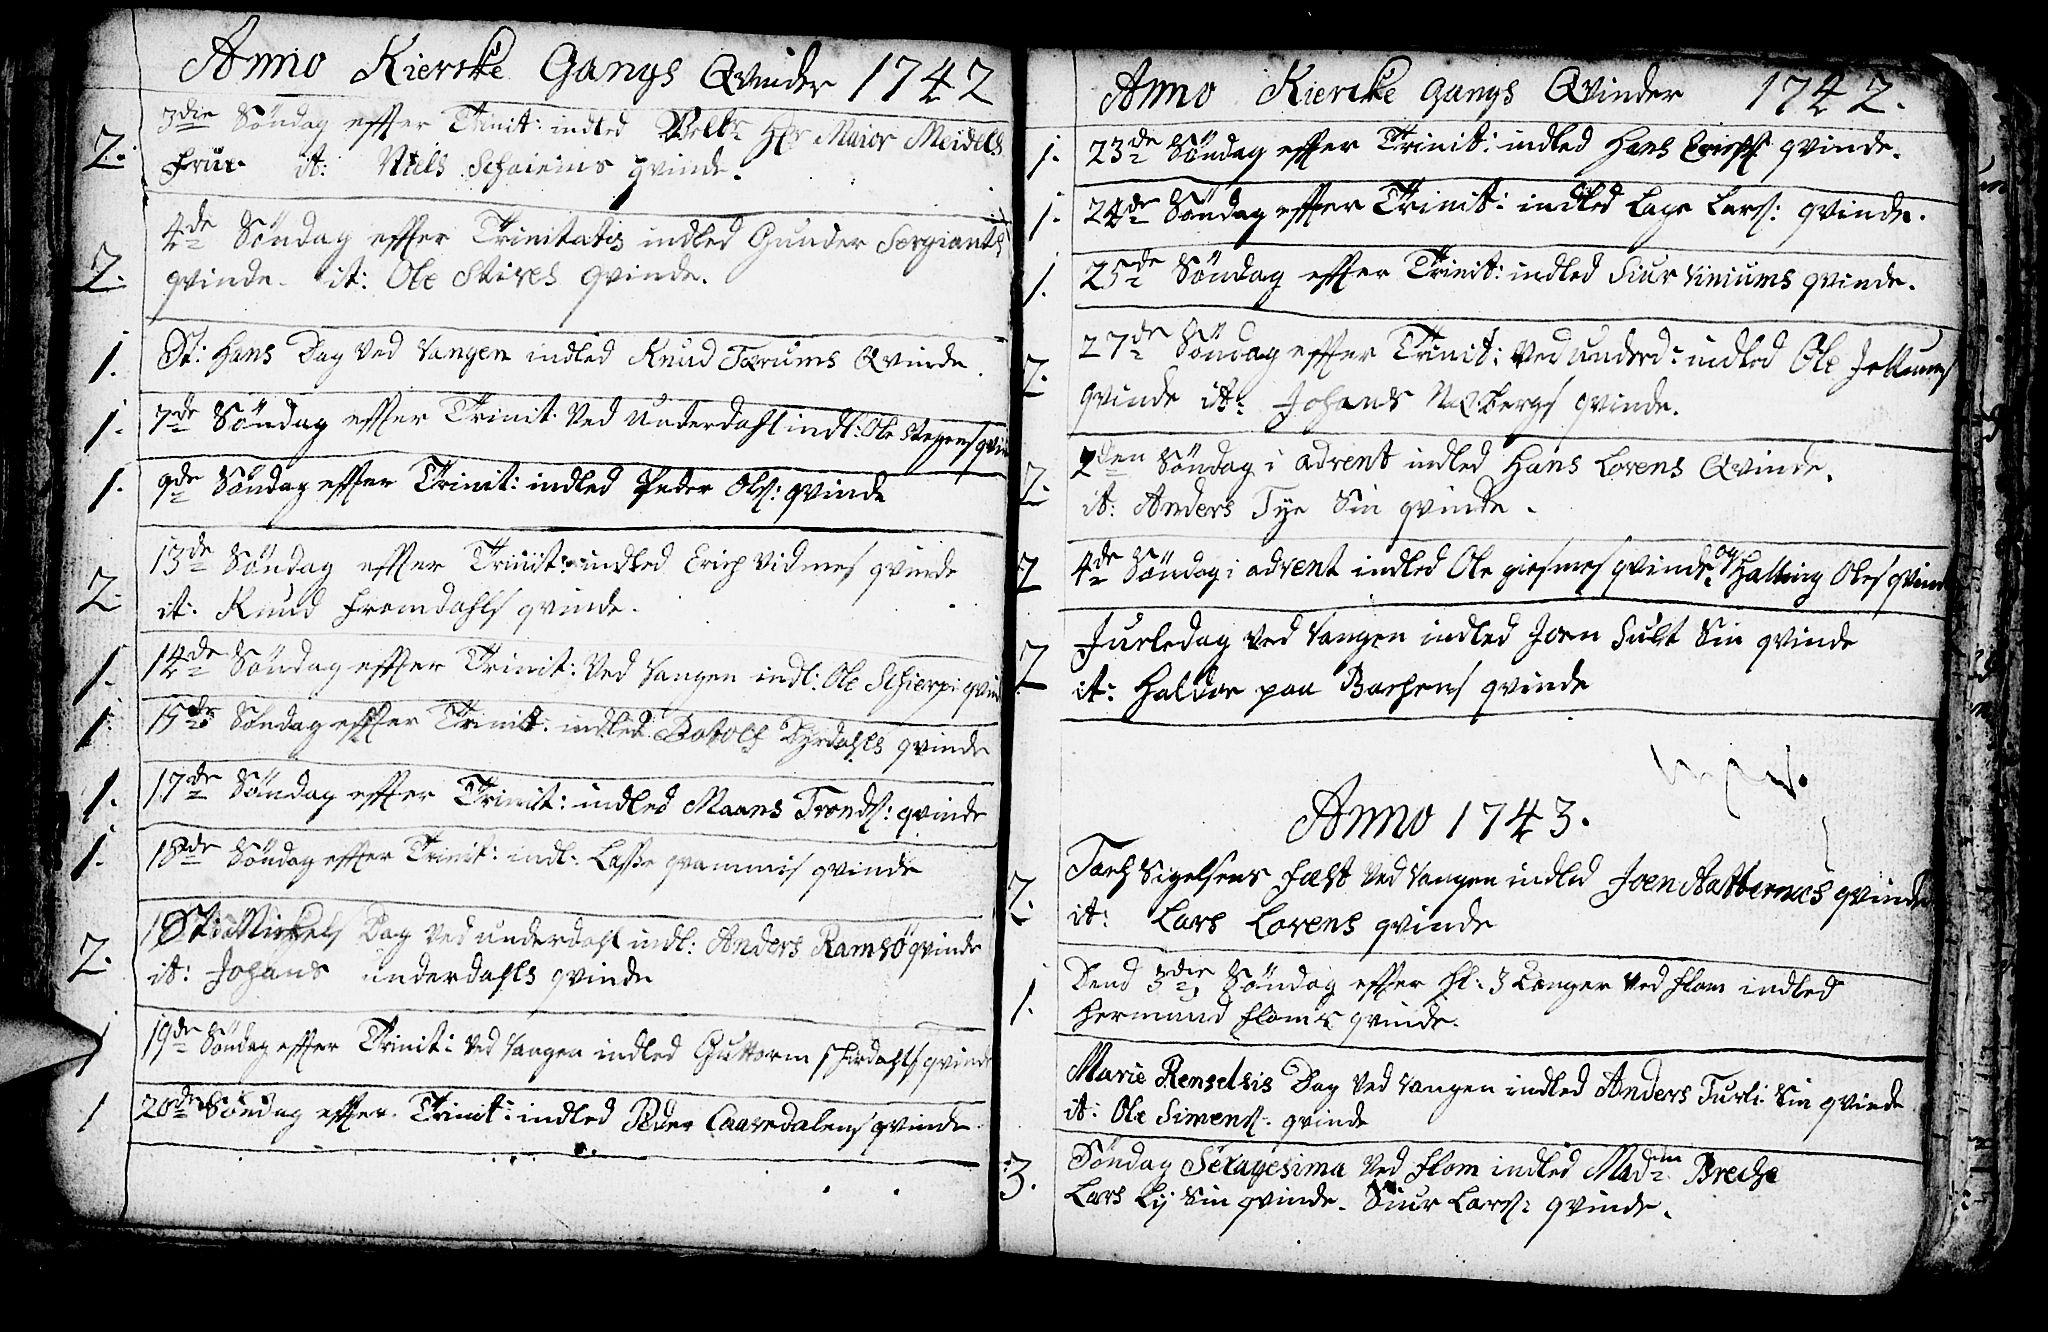 SAB, Aurland sokneprestembete, H/Ha/Haa/L0003: Ministerialbok nr. A 3, 1735-1761, s. 141